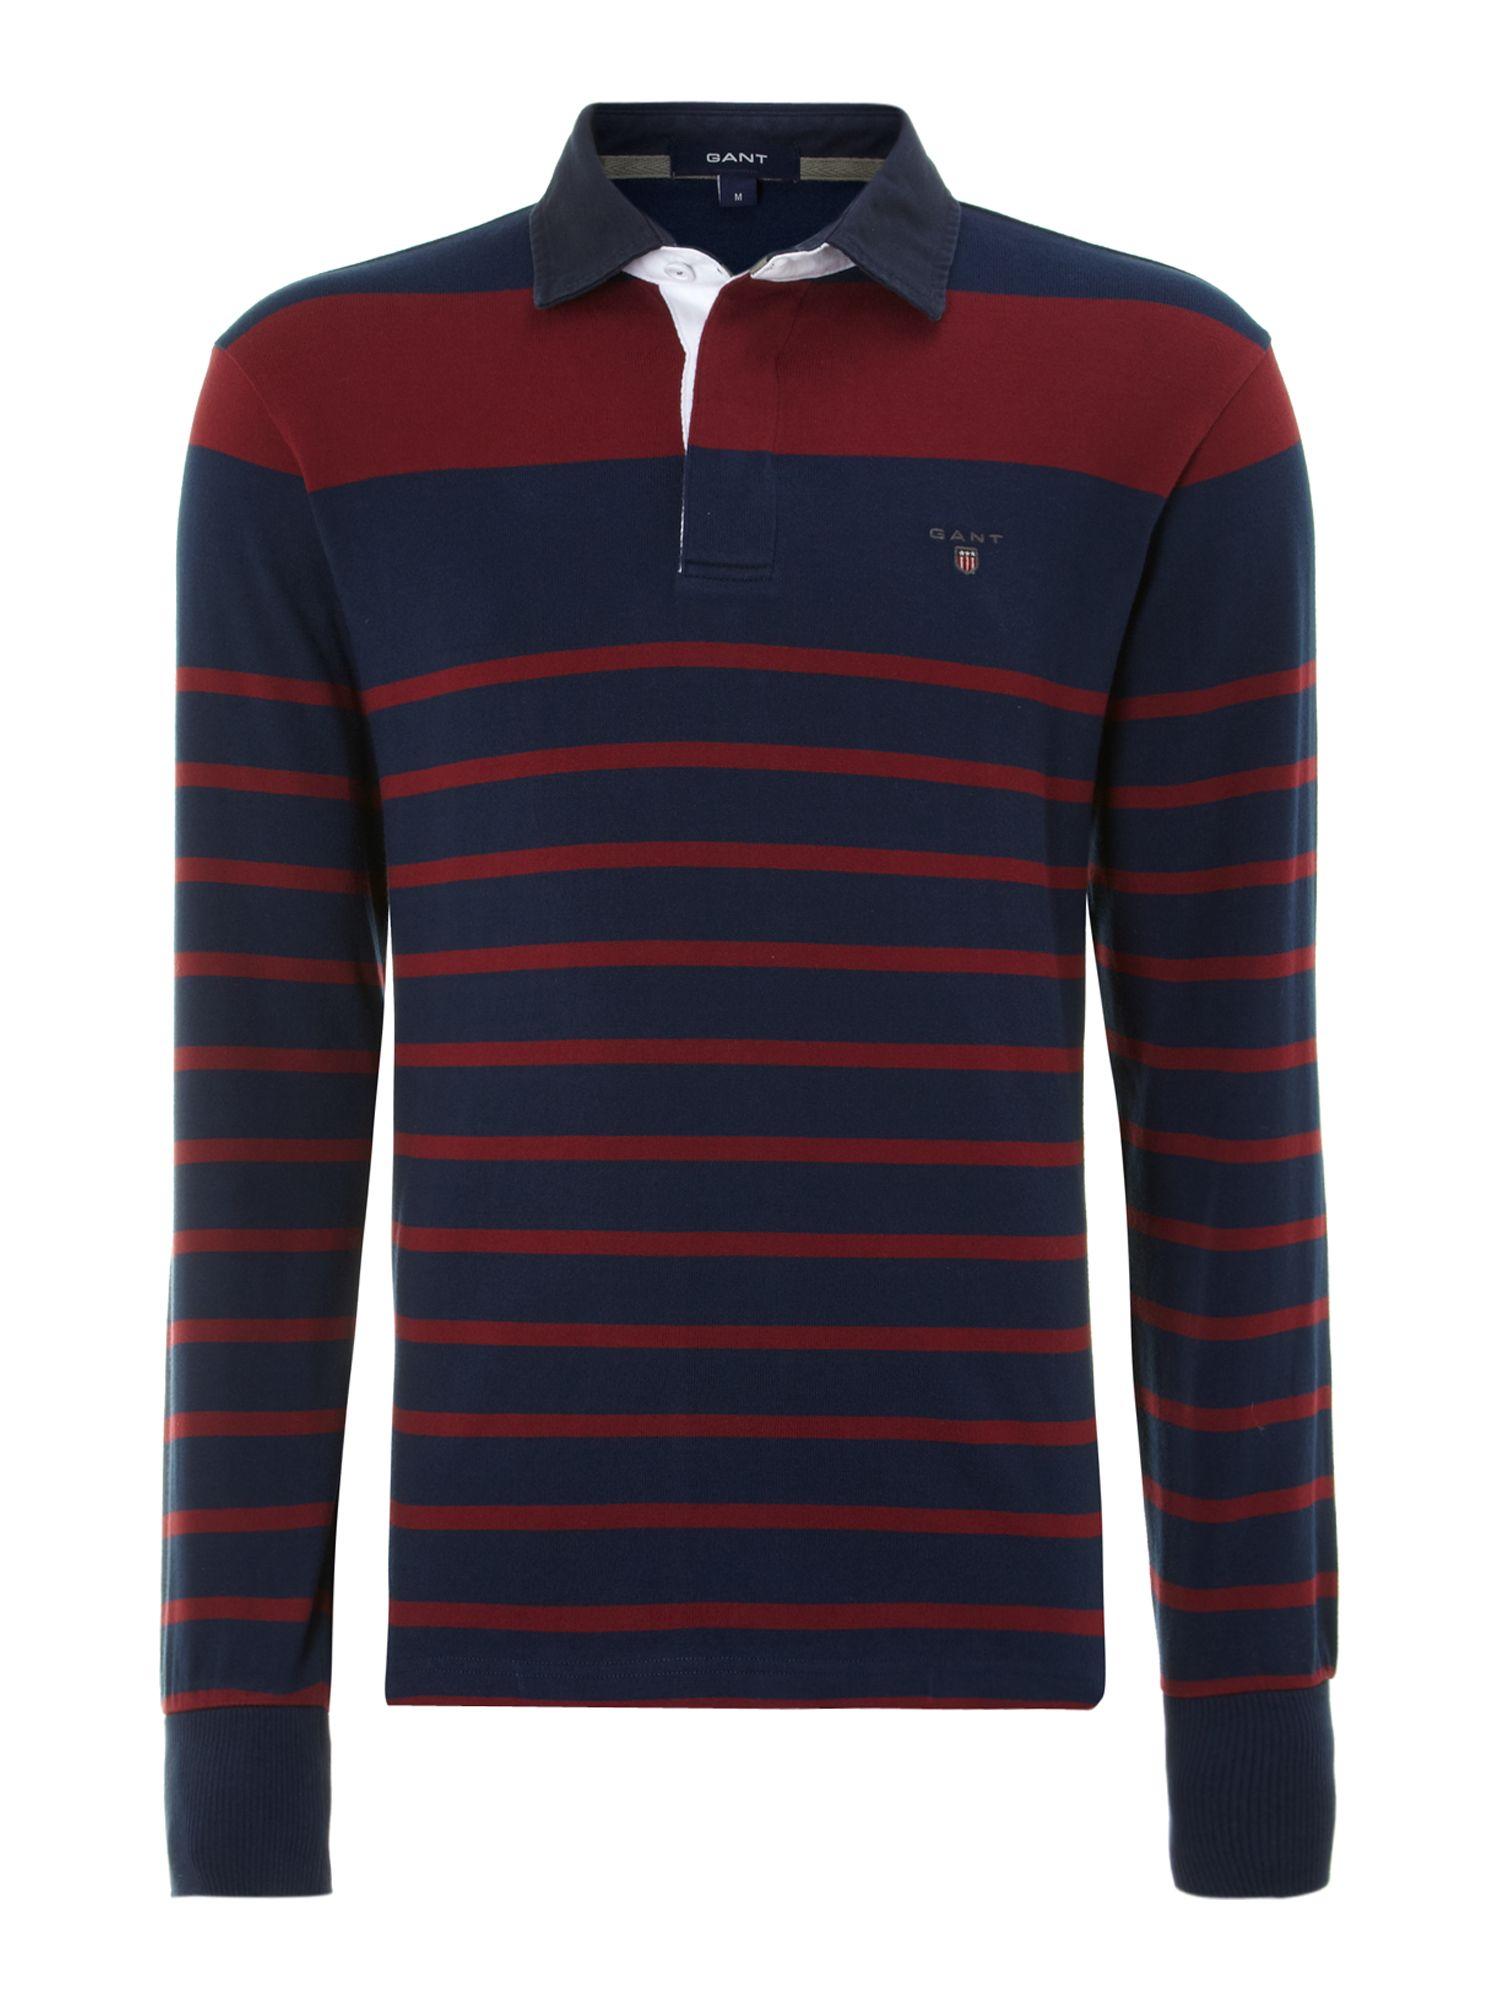 Long Sleeve Striped T Shirt Men